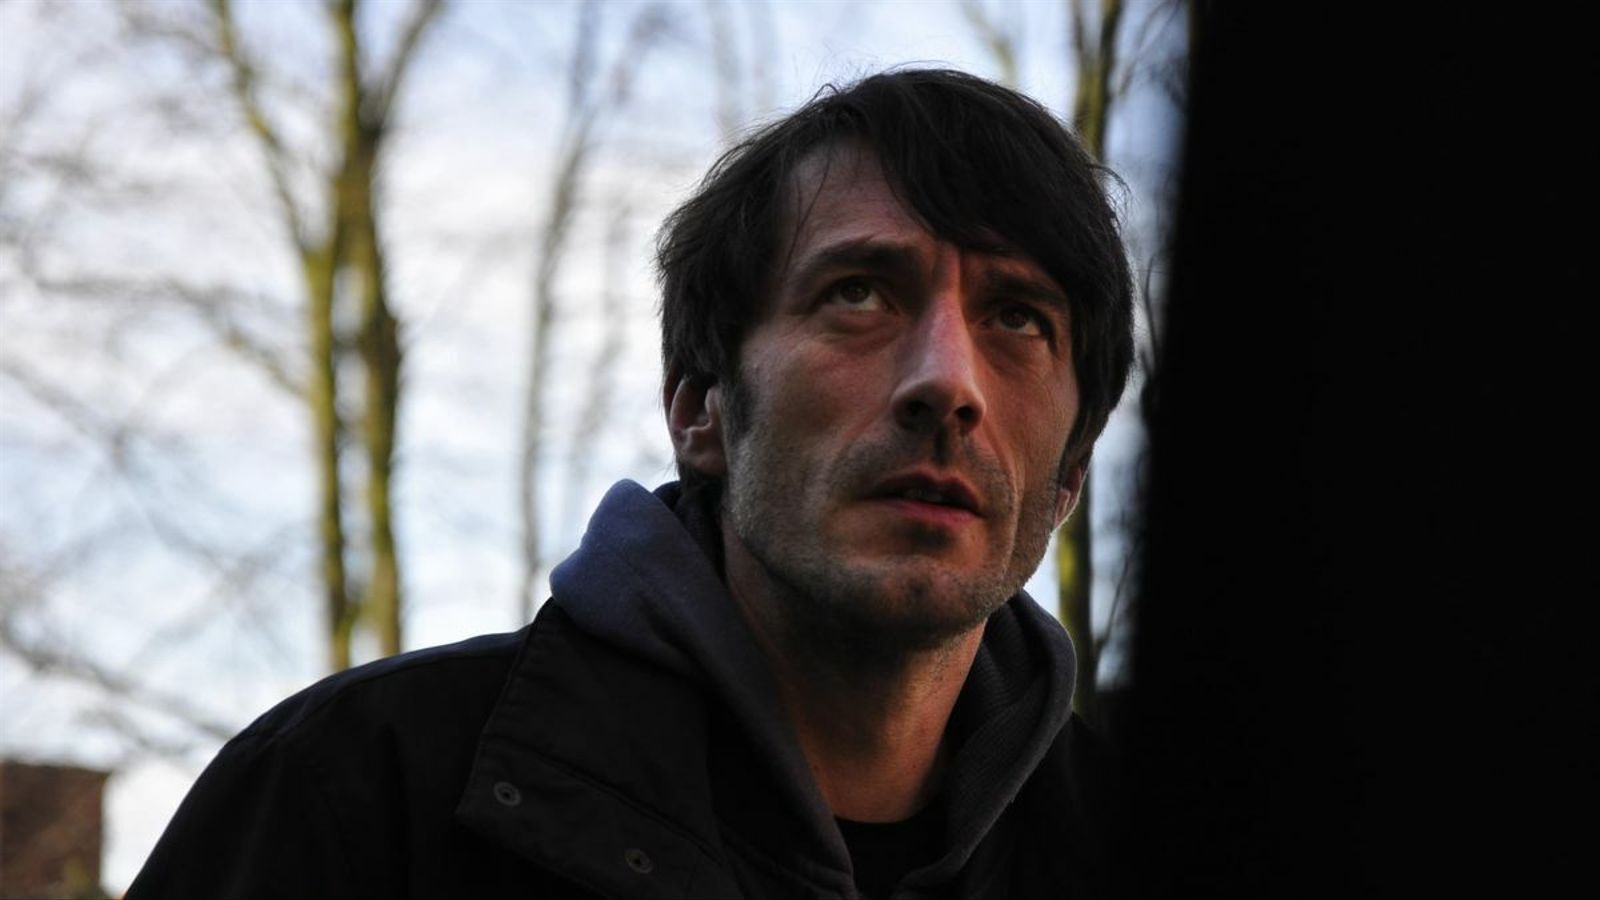 'The ghoul': Un psicodrama entre l'onirisme de Lynch i la paranoia polanskiana